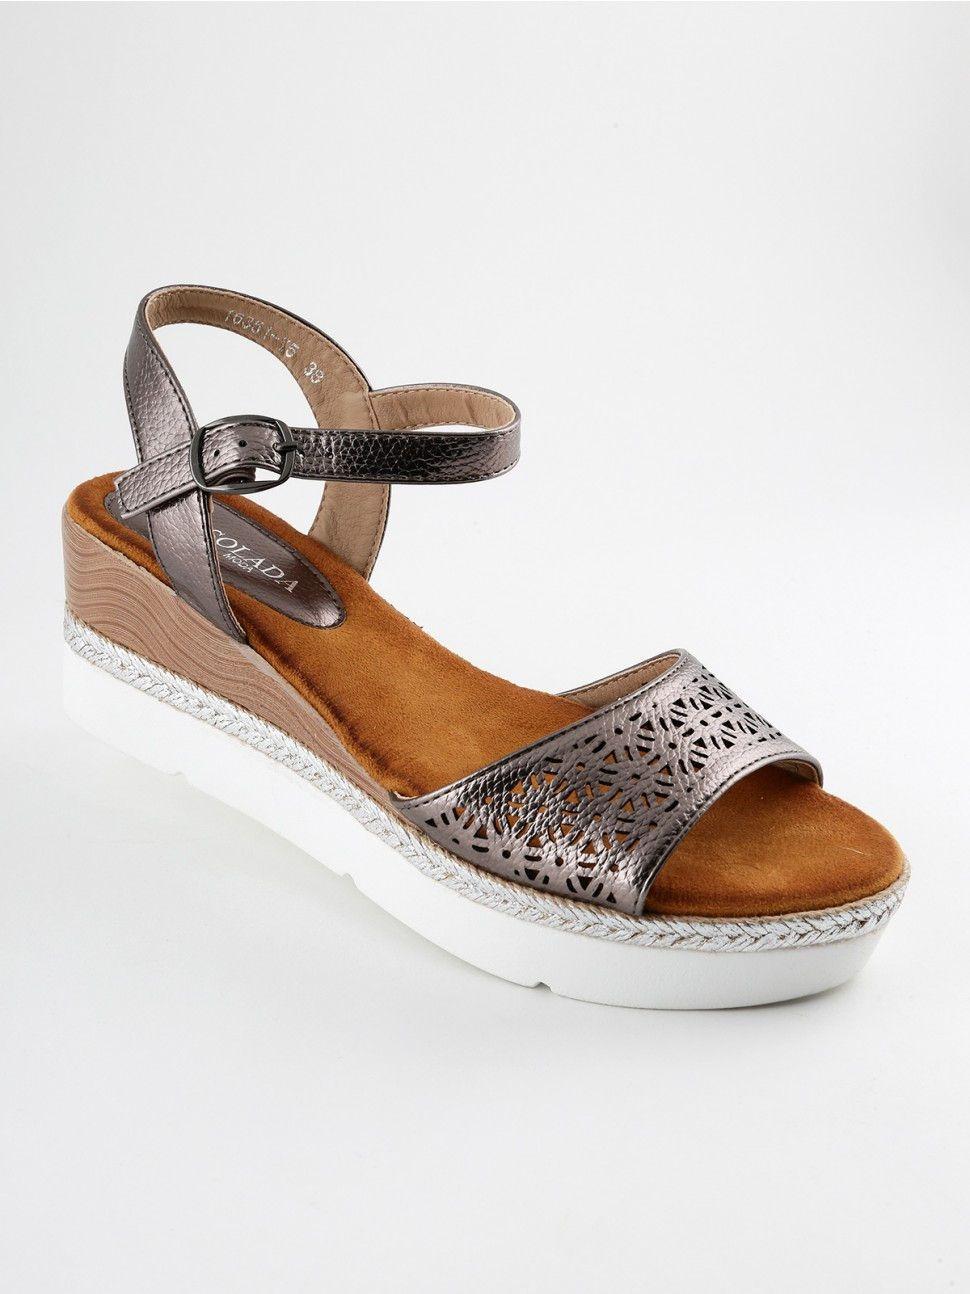 2f13af3d12 Sandali zeppa con platform | scarpe | Zeppe, Sandali e Sandali con ...